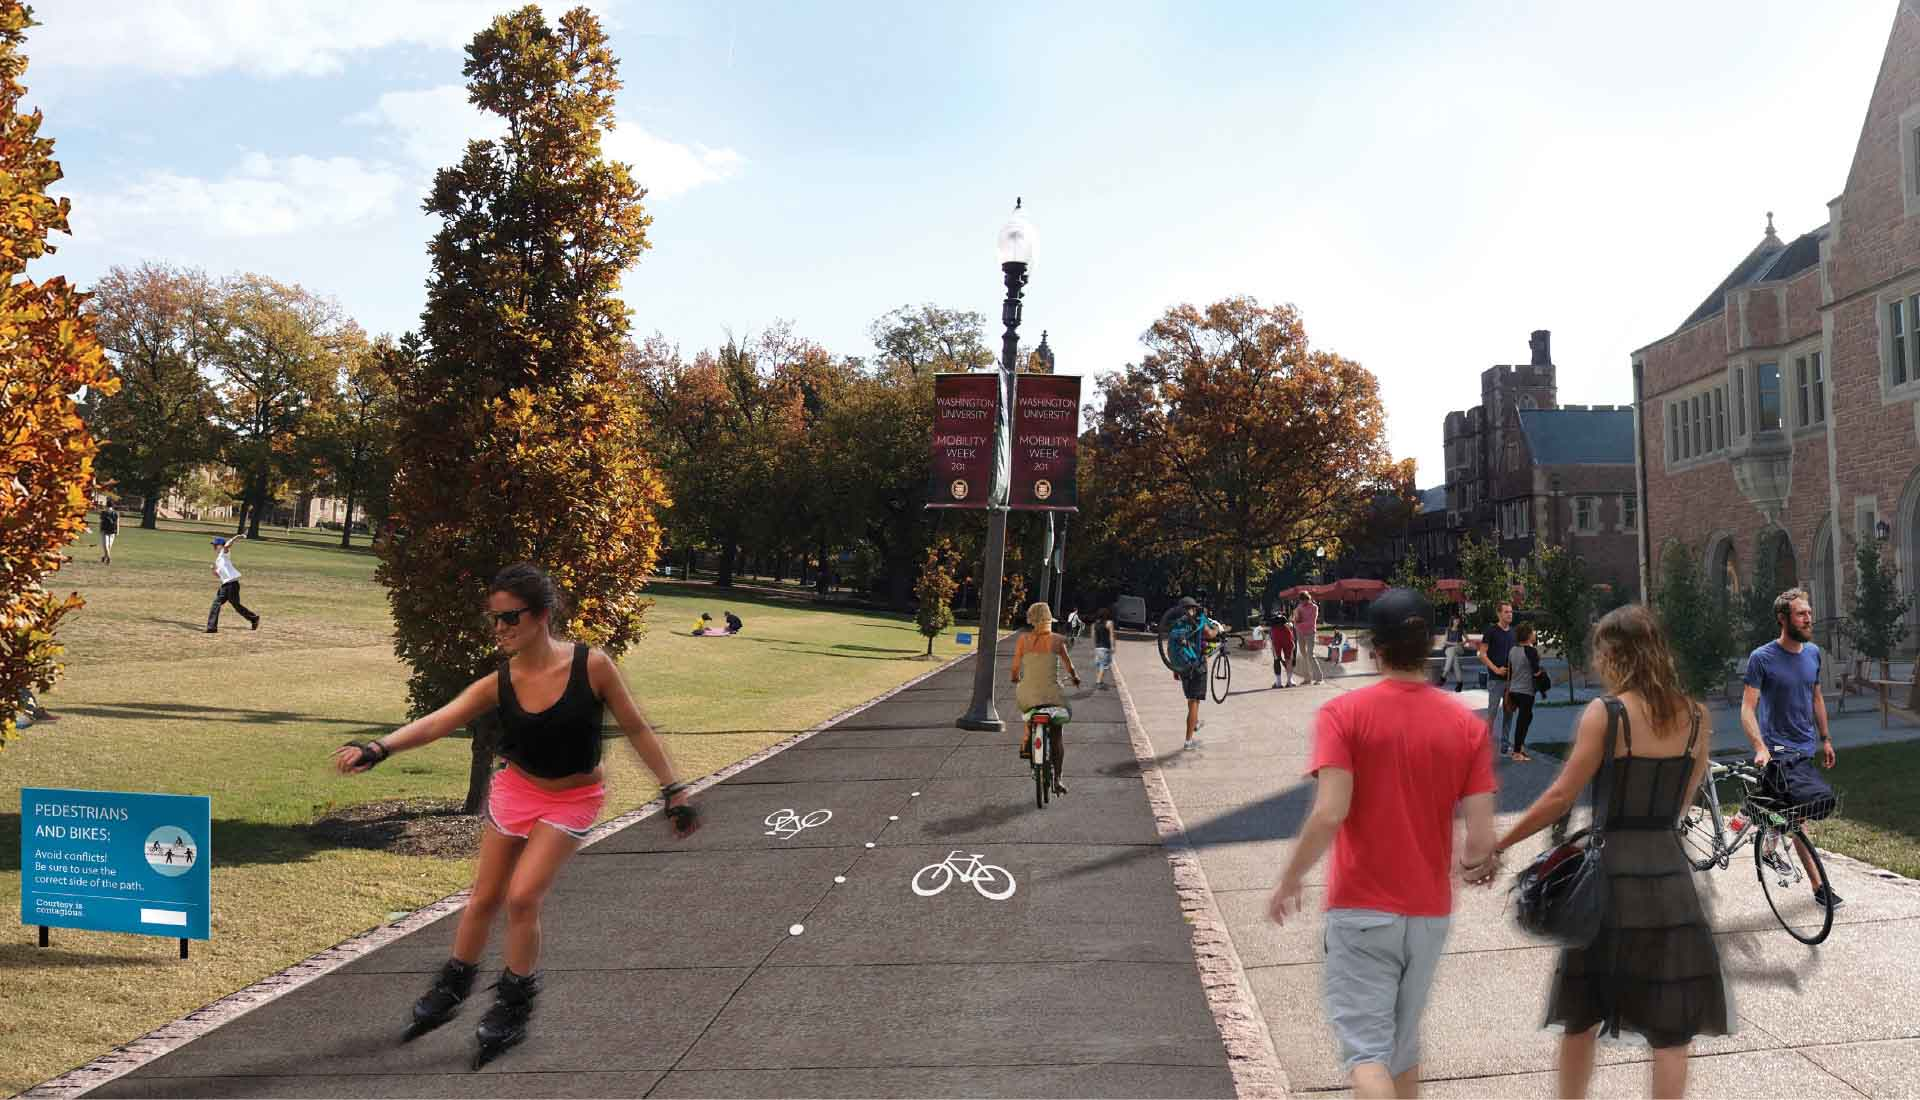 Arbolope Studio   Landscape Architects + Urban Designers   Mobility Framework Masterplan (Washington University in St. Louis)